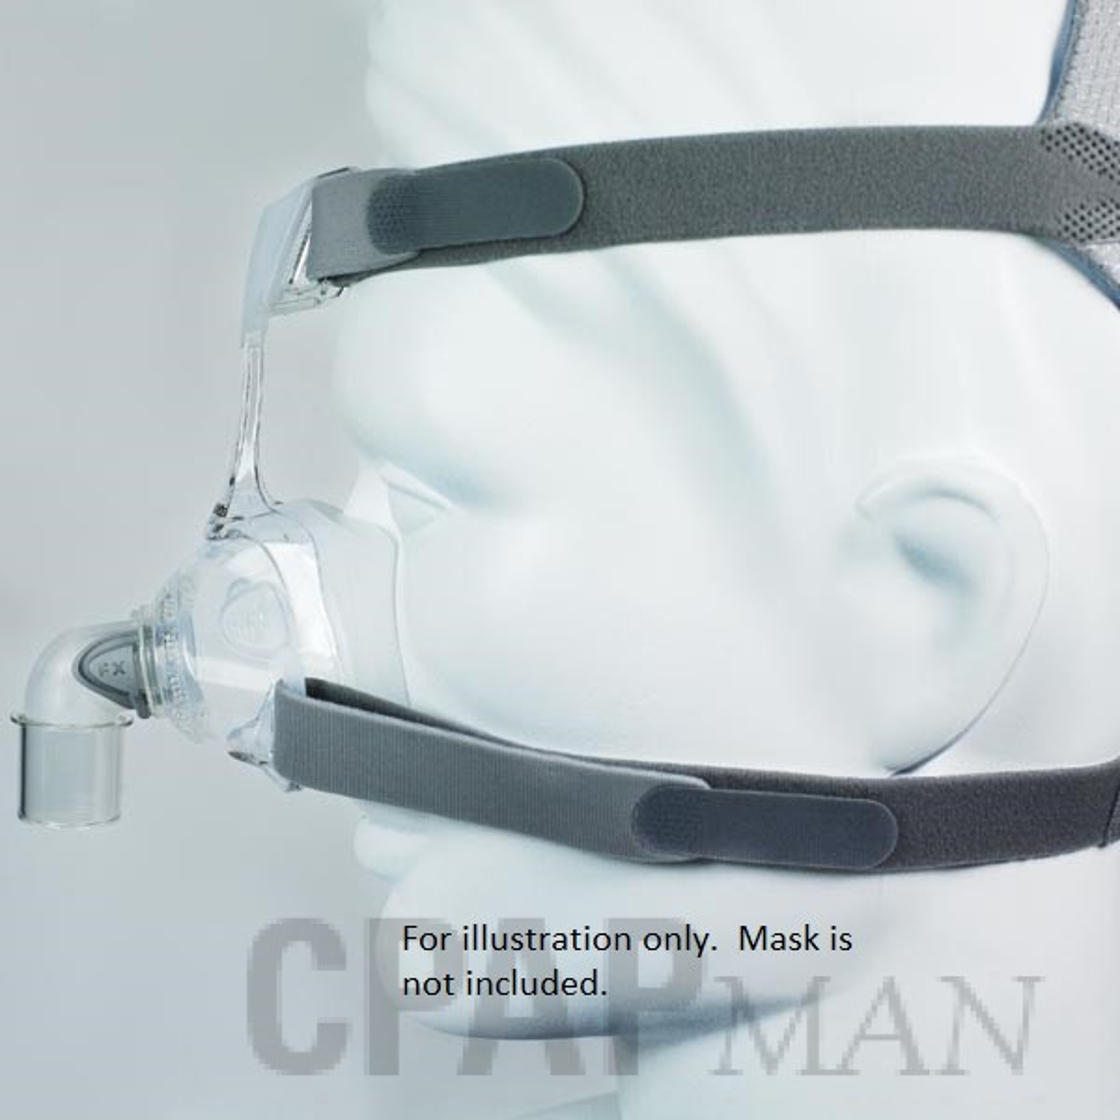 ResMed Mirage FX CPAP Mask Headgear